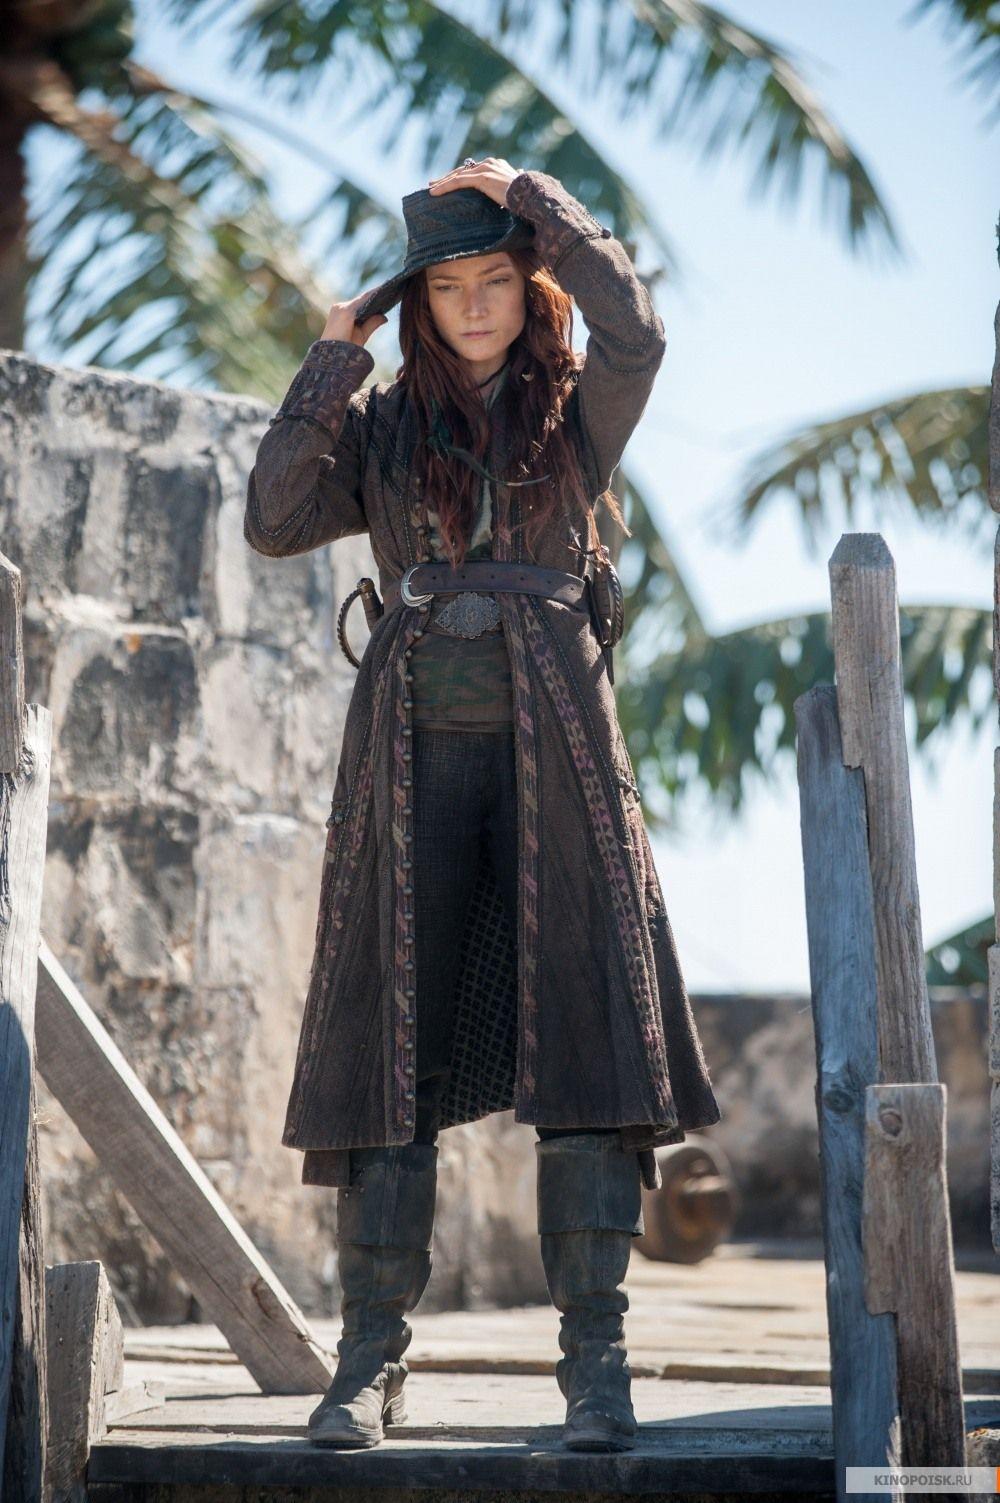 anne bonny - clara paget in black sails season 3 (tv series